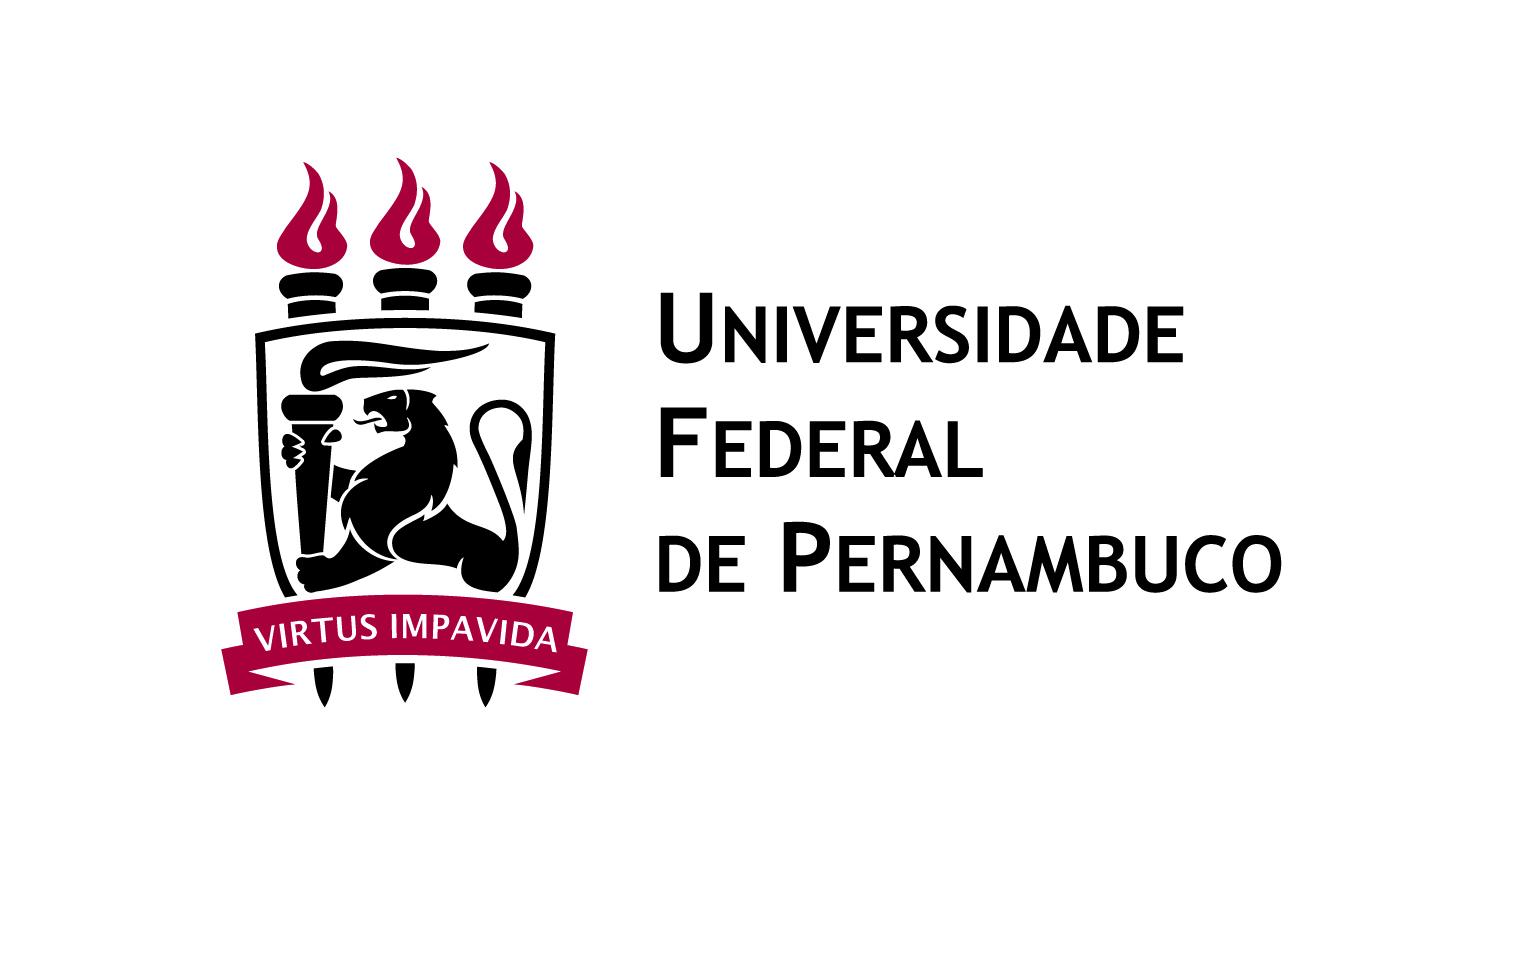 universidade federalpe saiu edital para todos os n237veis